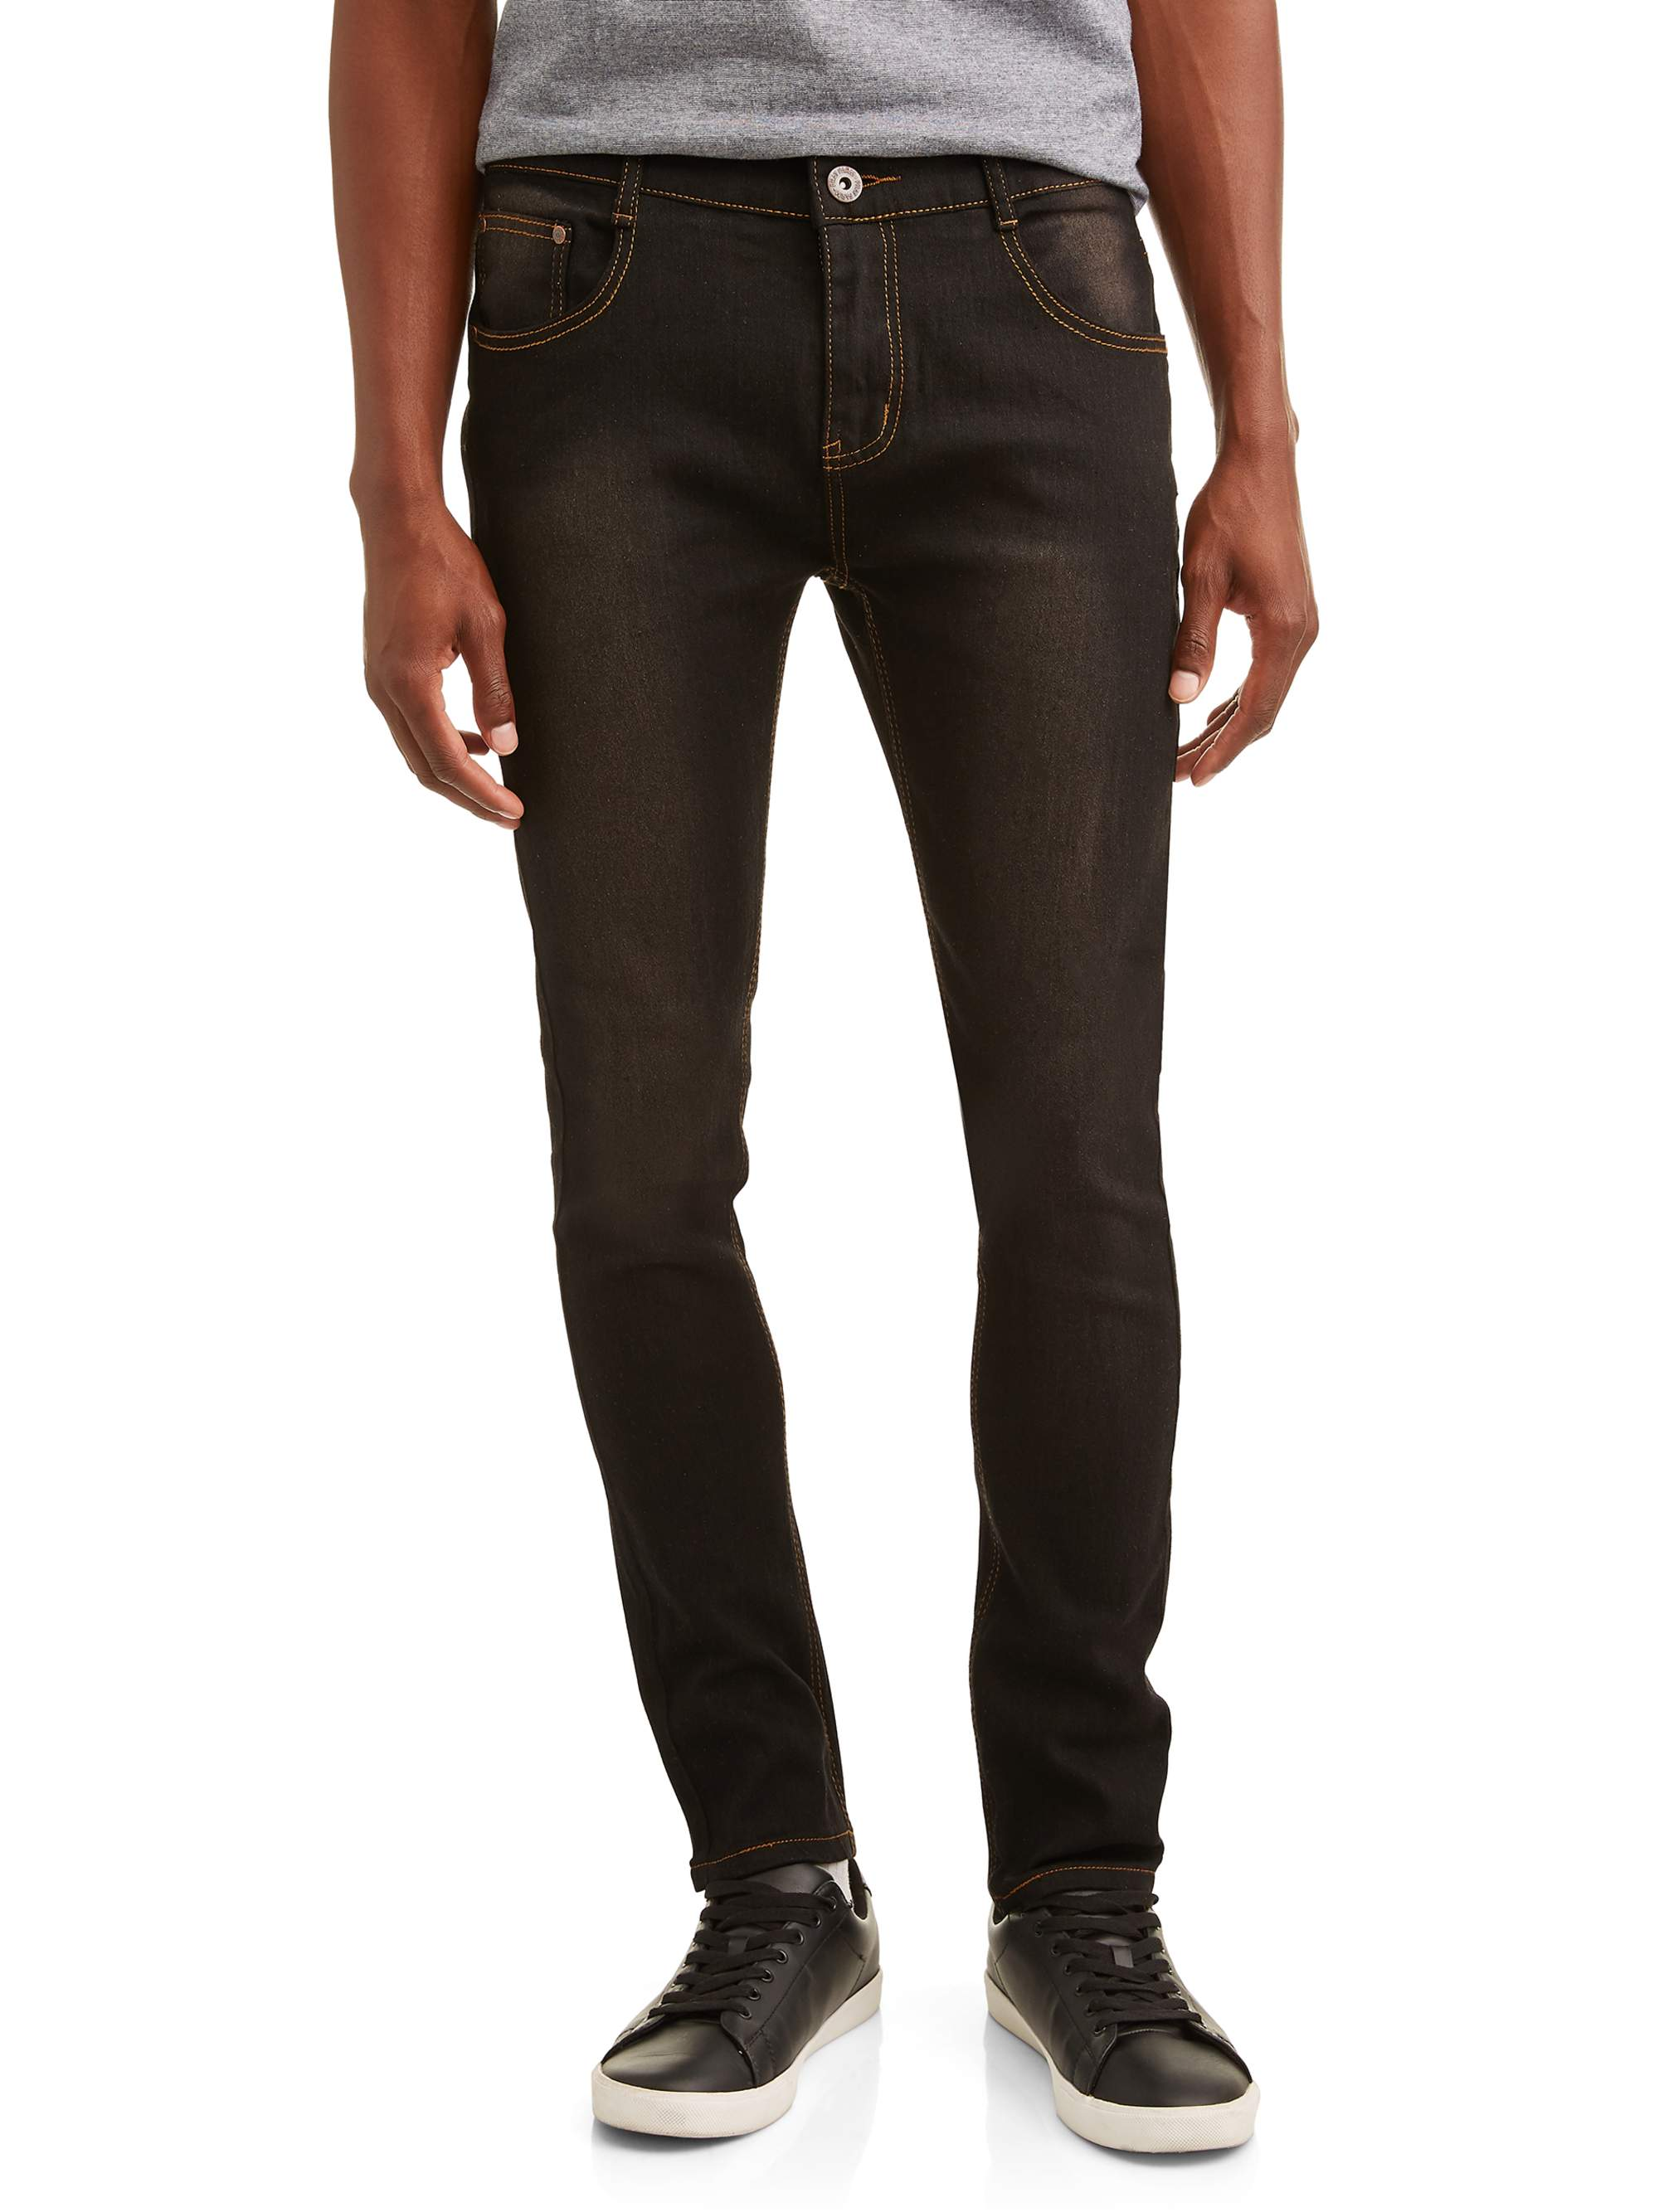 Phat Farm Men's Skinny Jeans